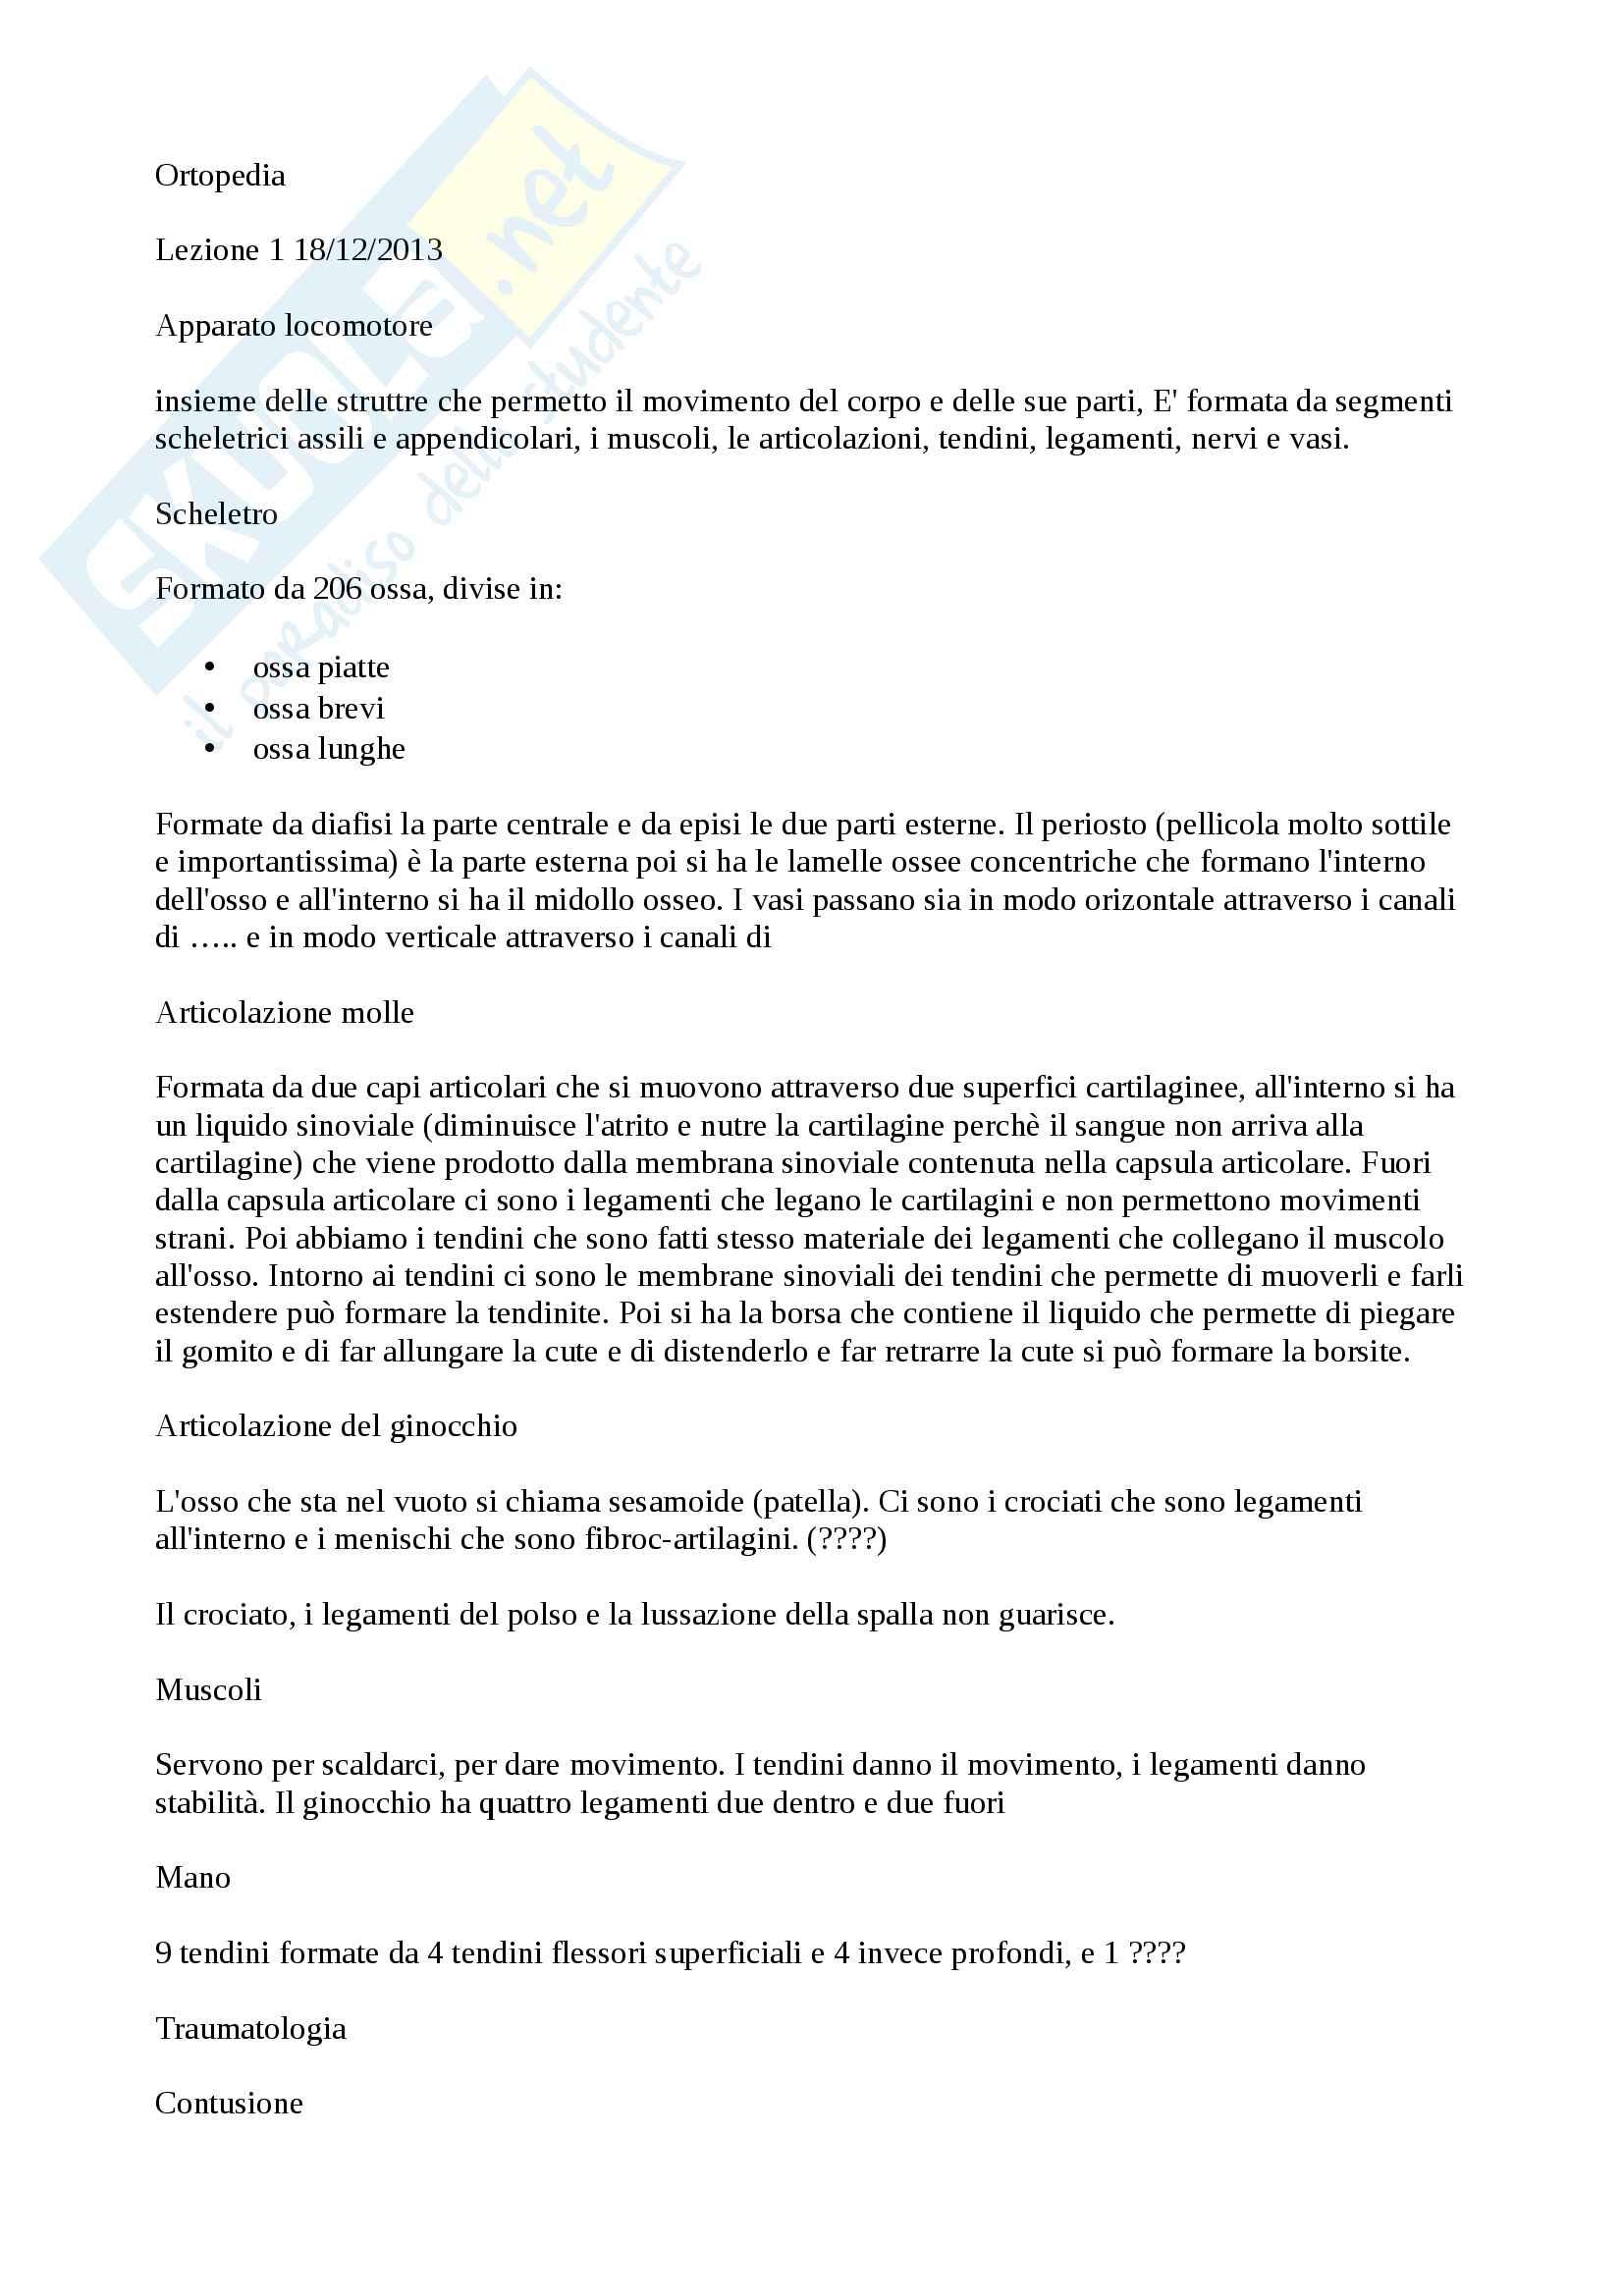 appunto R. Boldoroni Bianchi Innfermieristica in emergenza